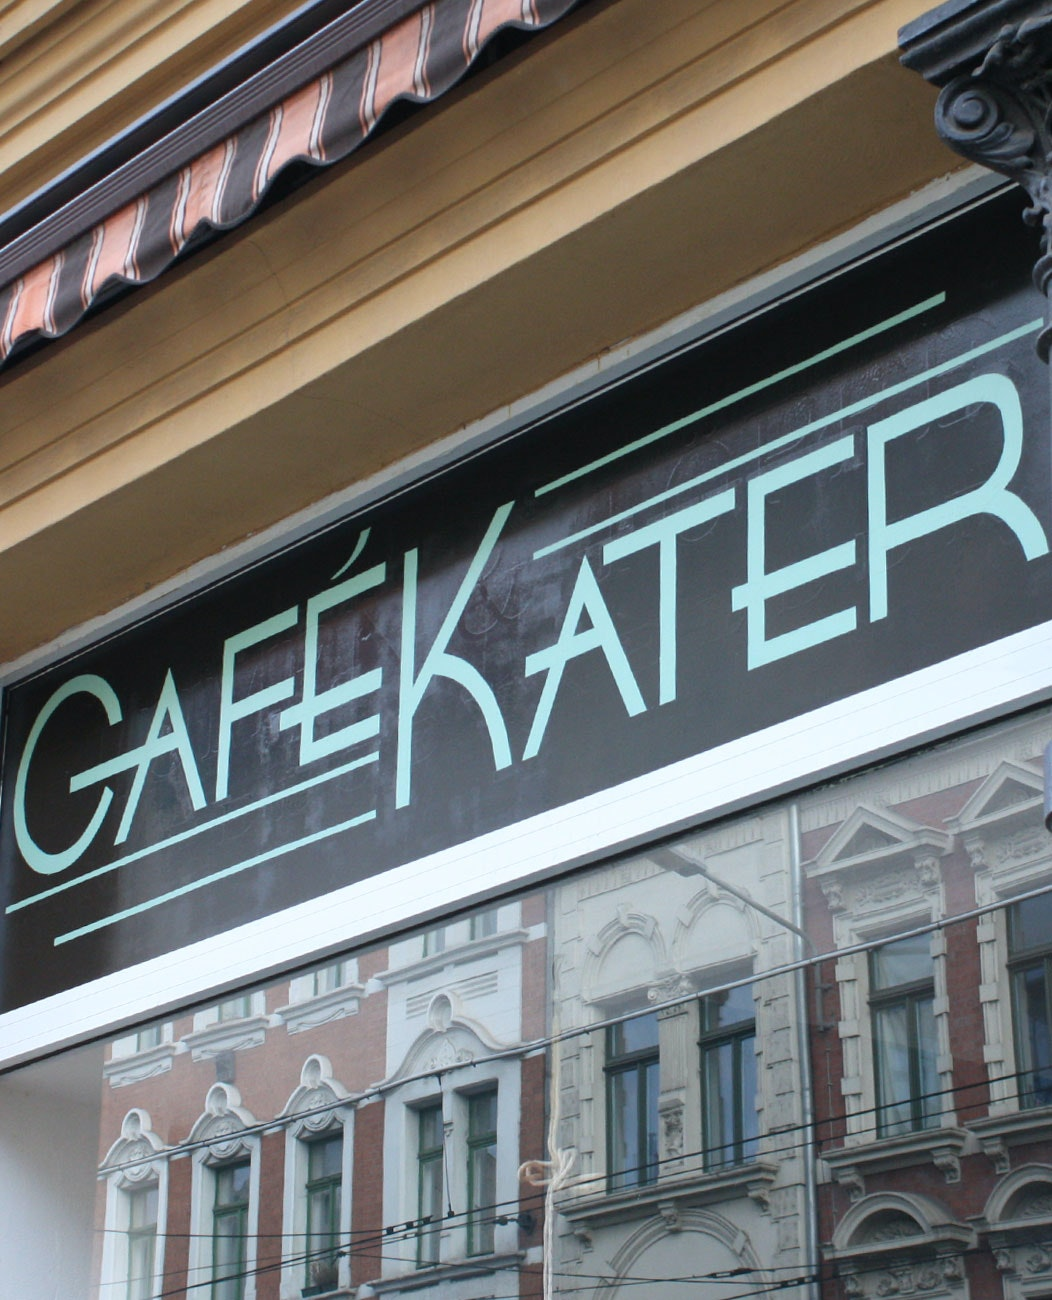 Café Kater